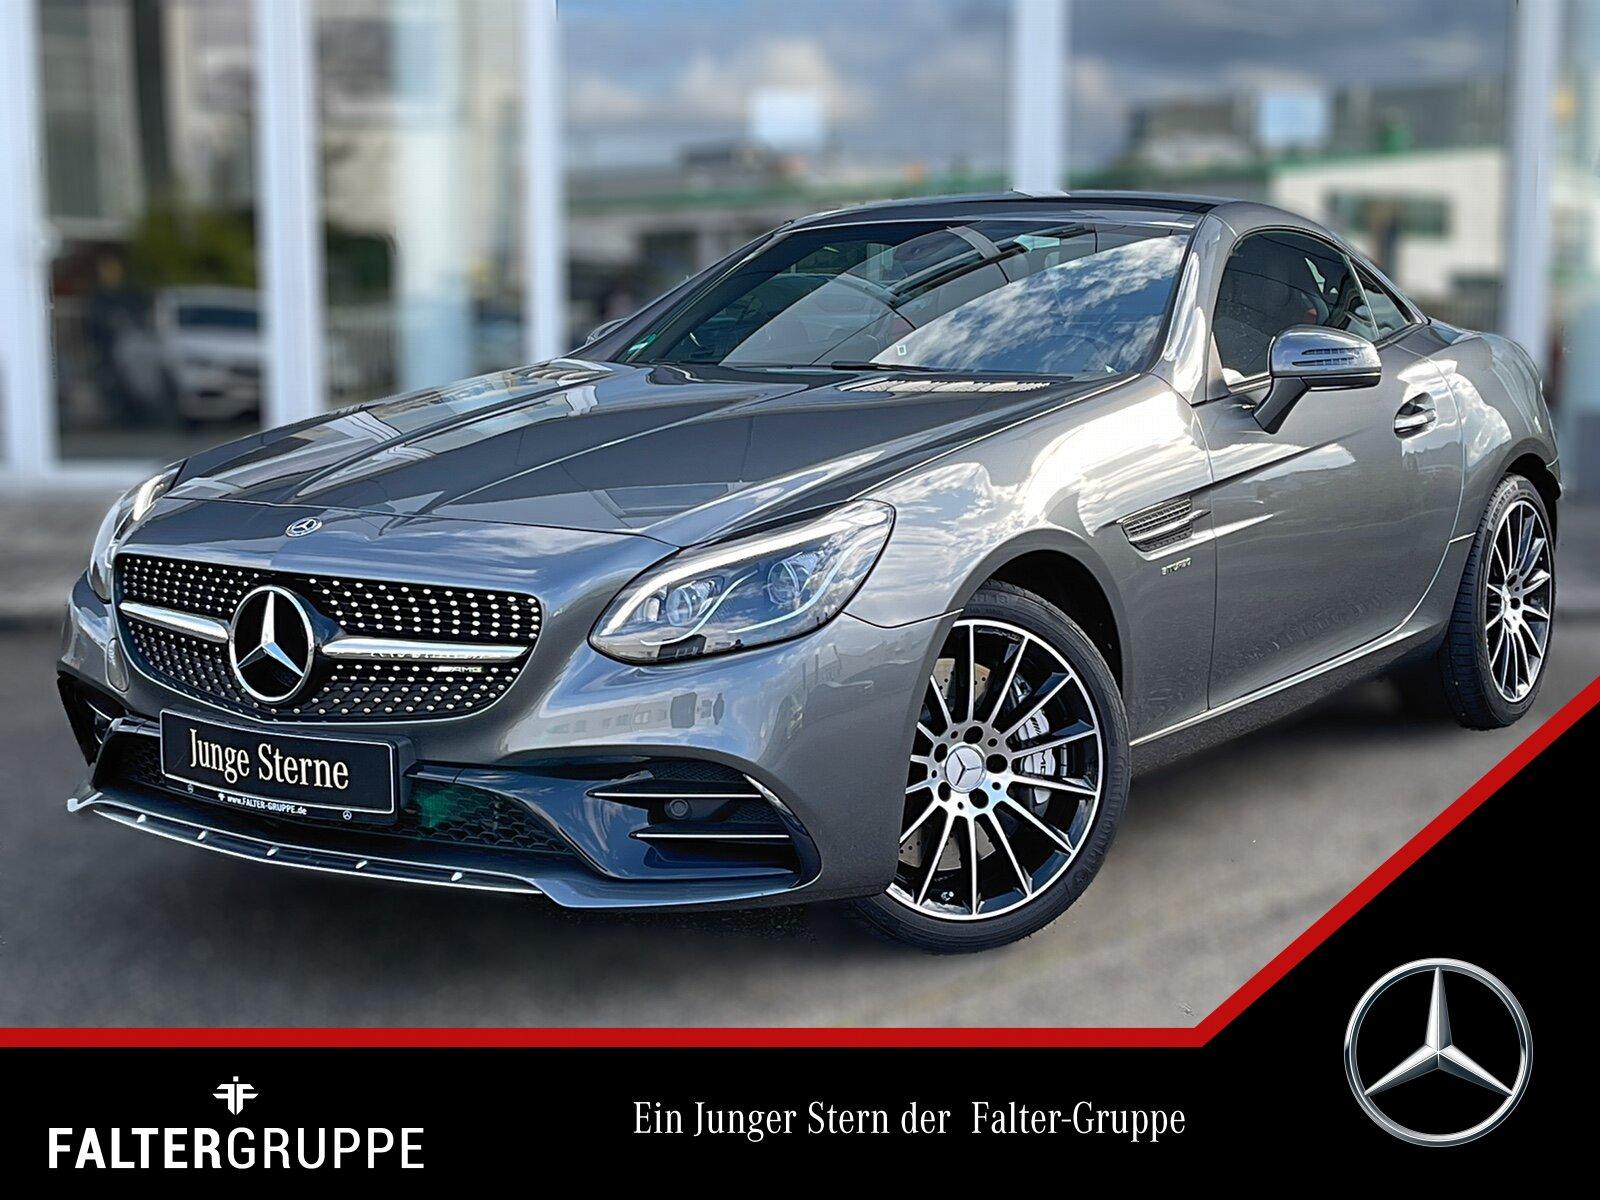 Mercedes-Benz SLC 43 AMG KAMERA+ILS+PANO+AIRSCARF+TOTWINKEL+18, Jahr 2019, Benzin